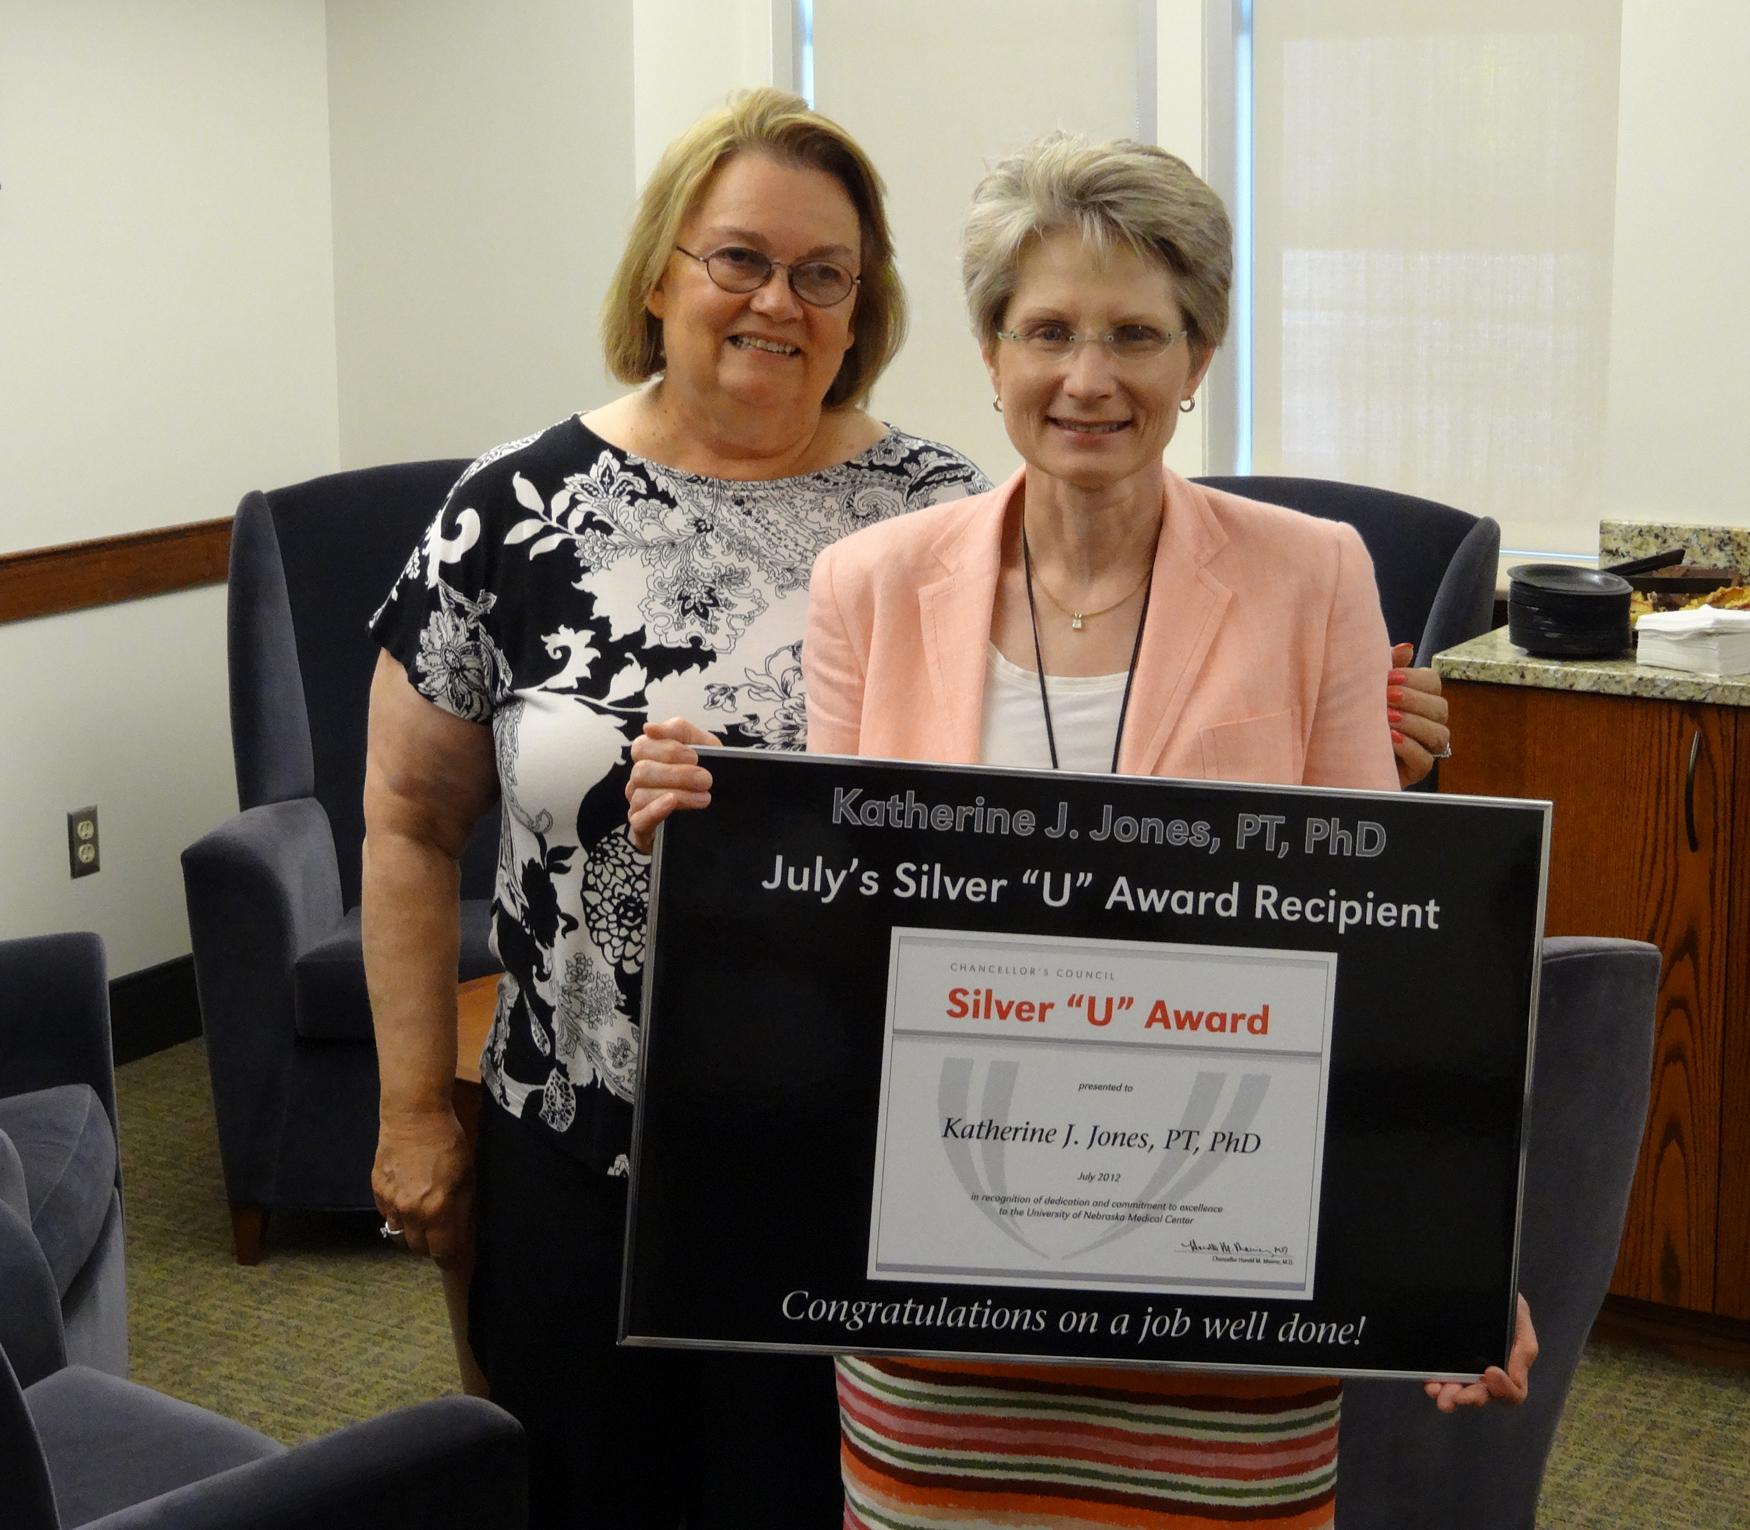 photo of Katherine Jones receiving award